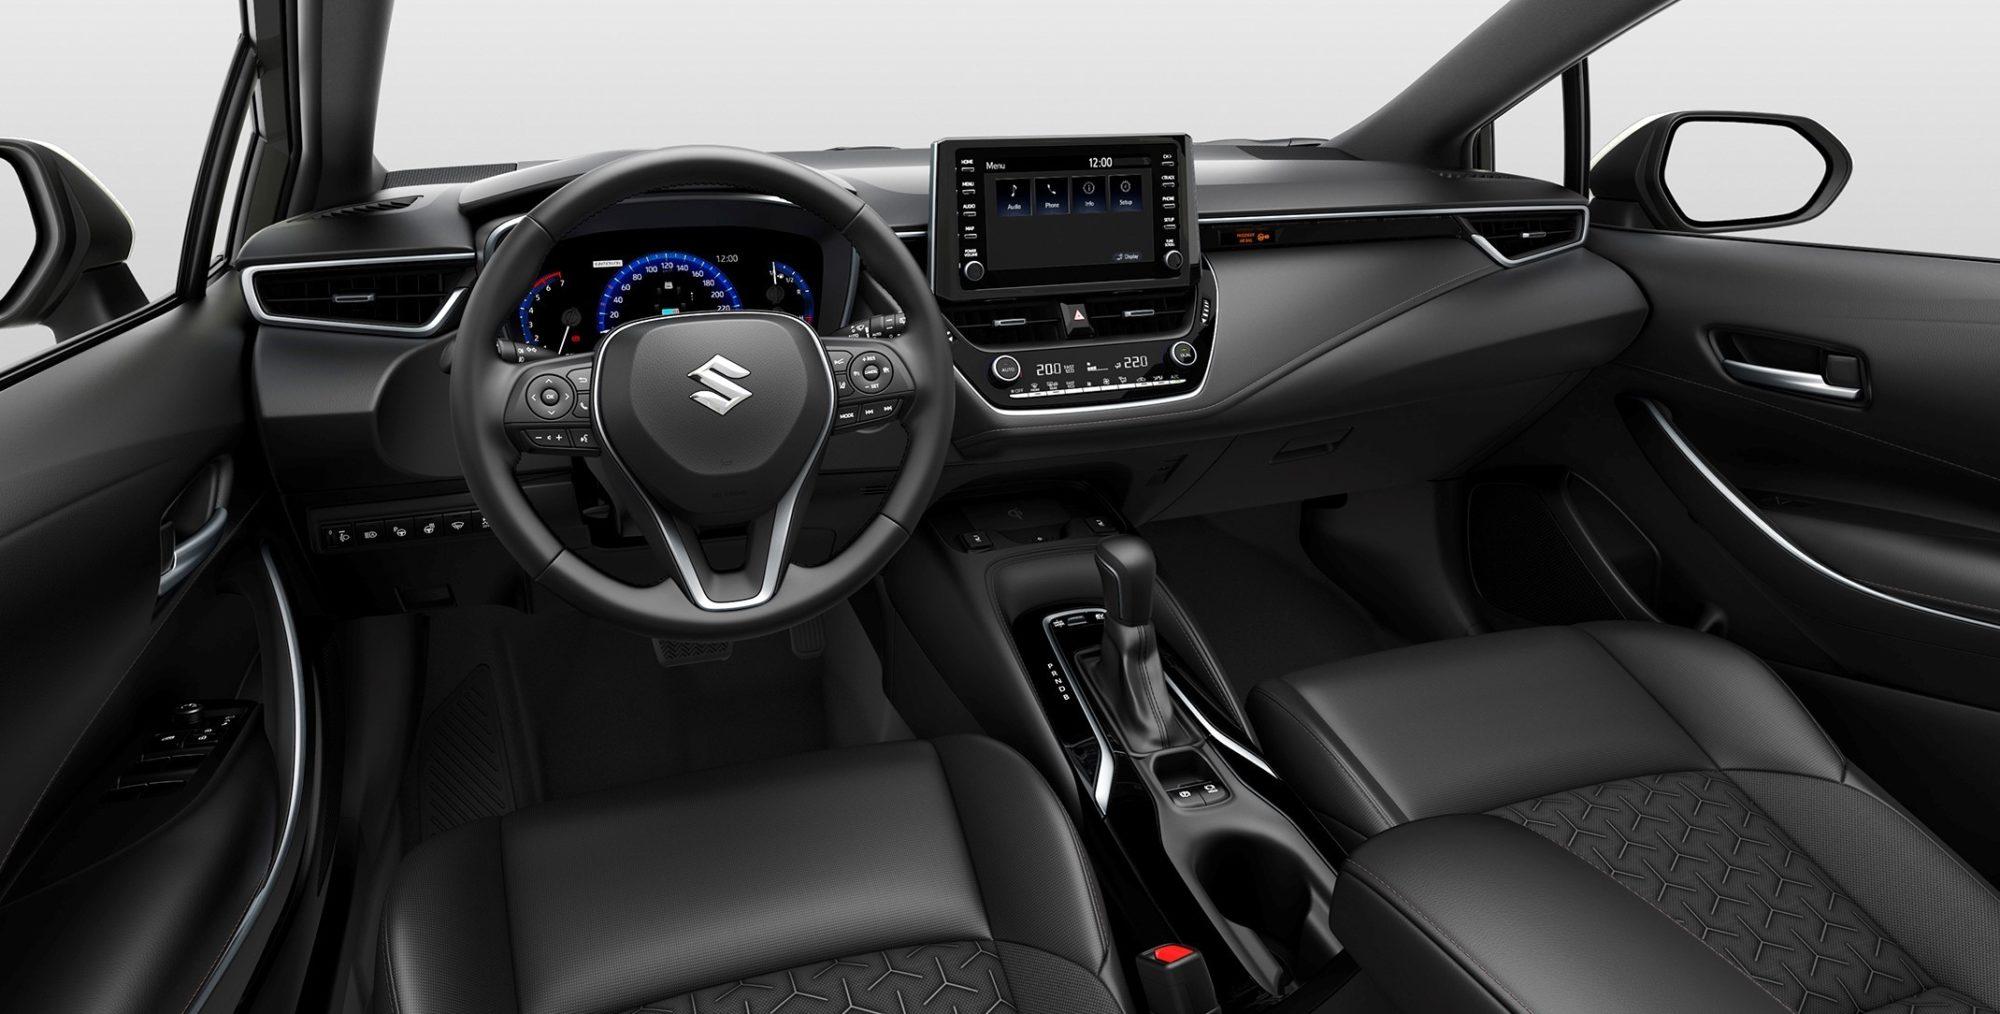 Suzuki Swace 2020 - Interior Design